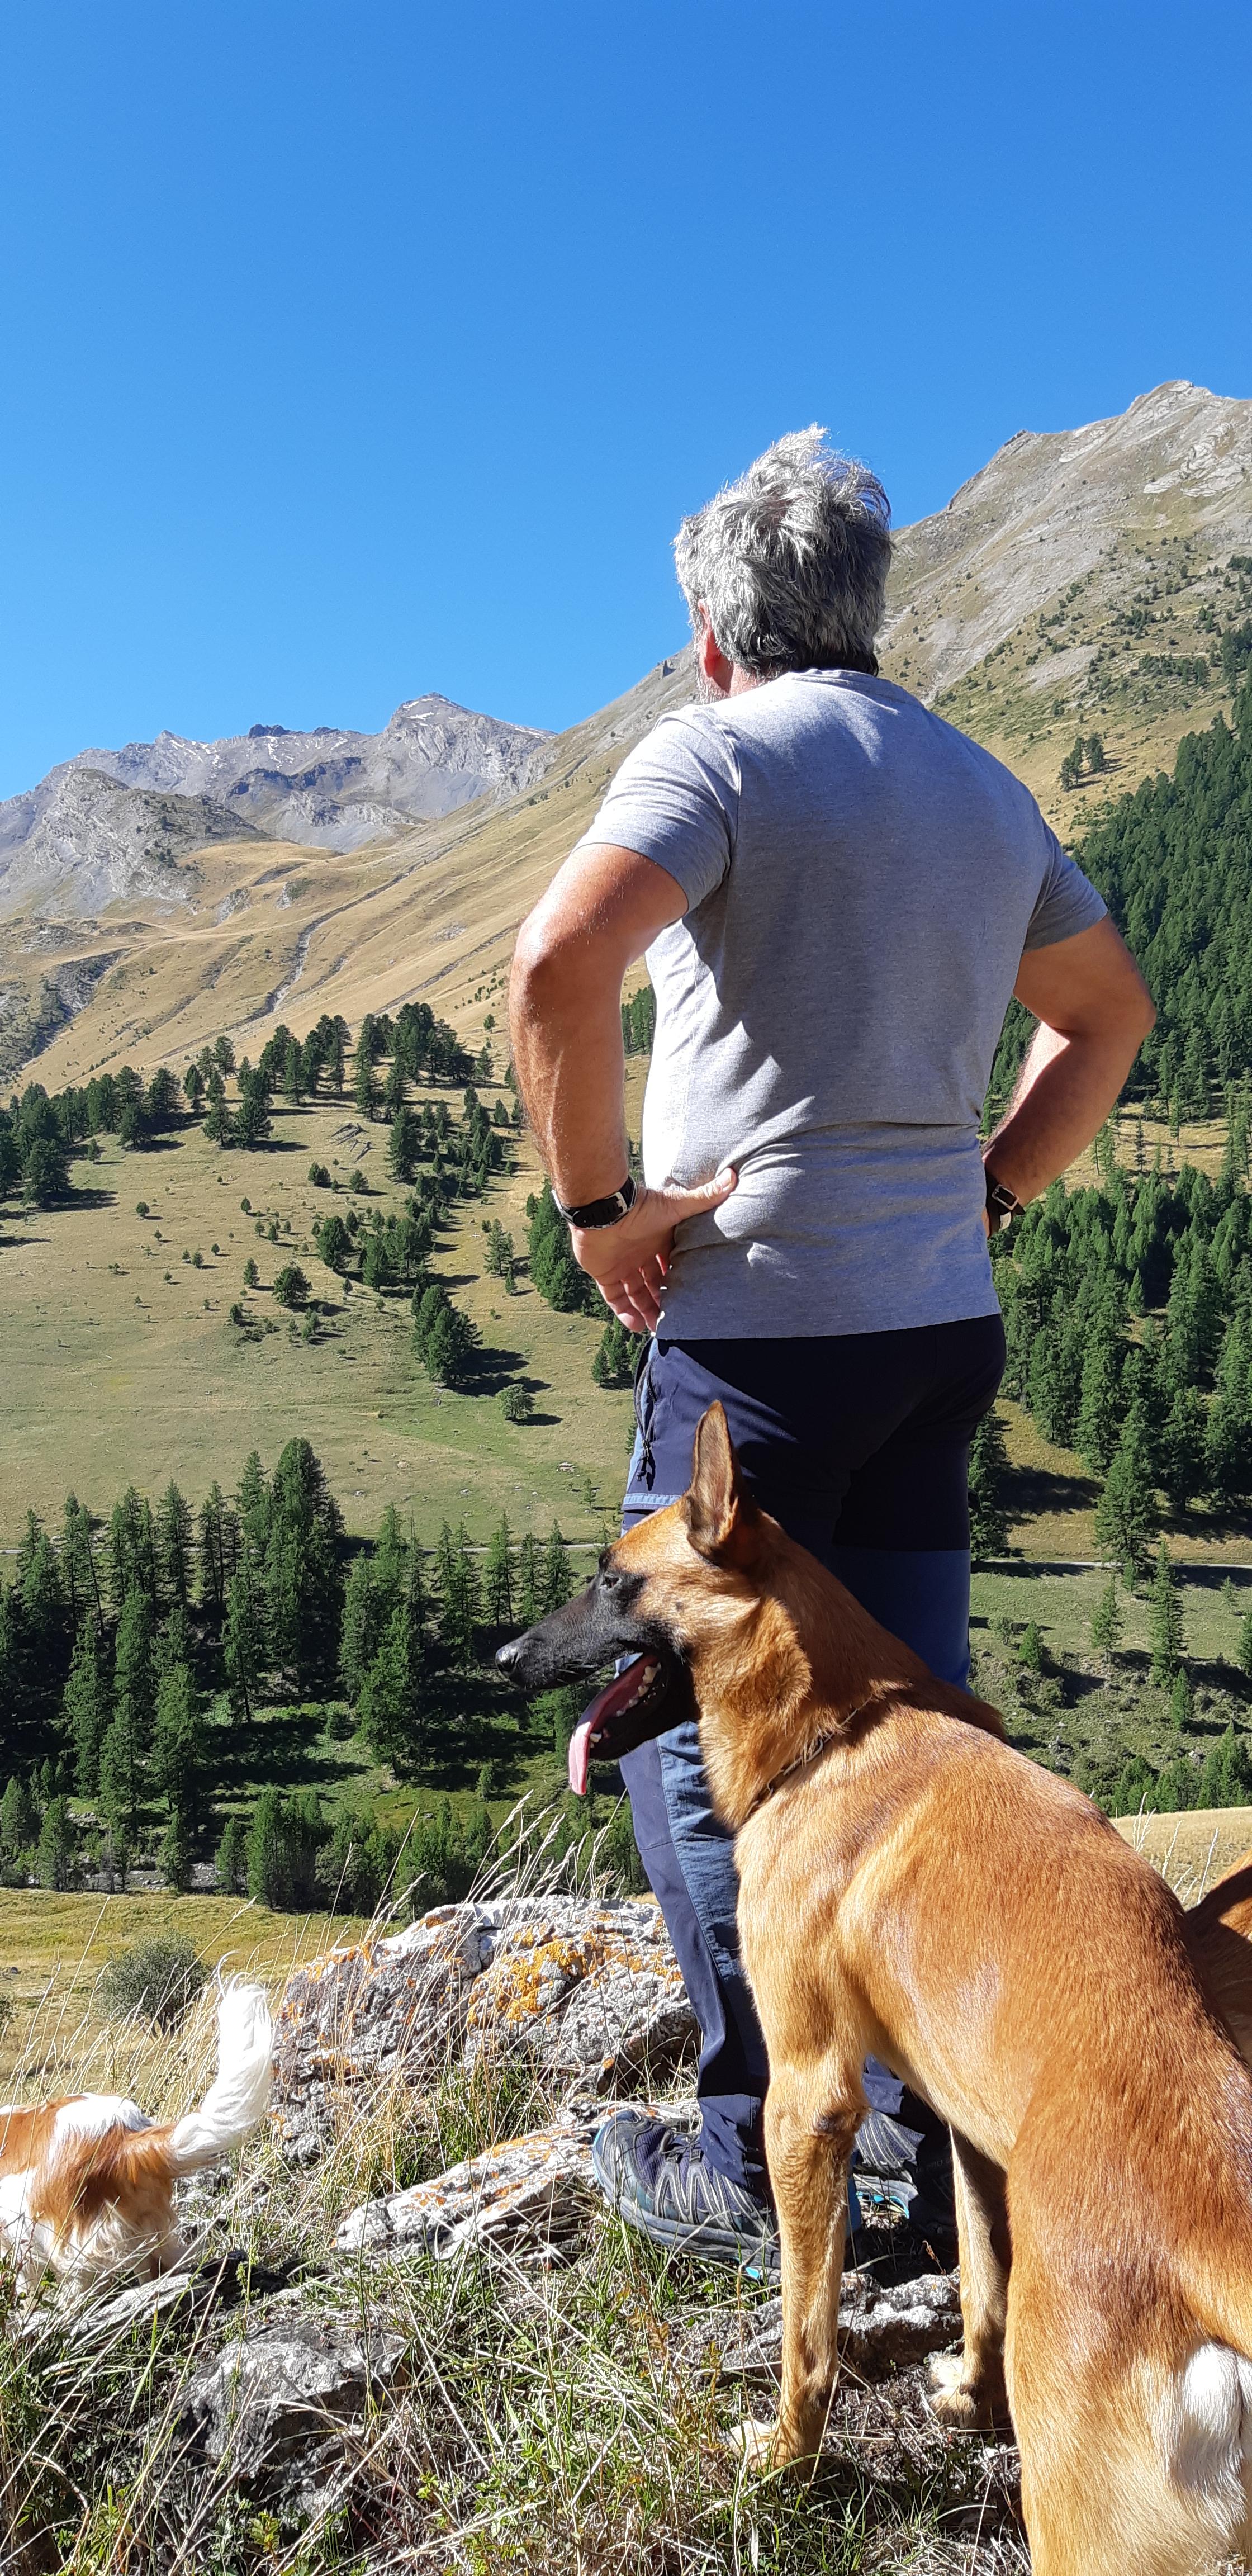 Mustang en randonnée